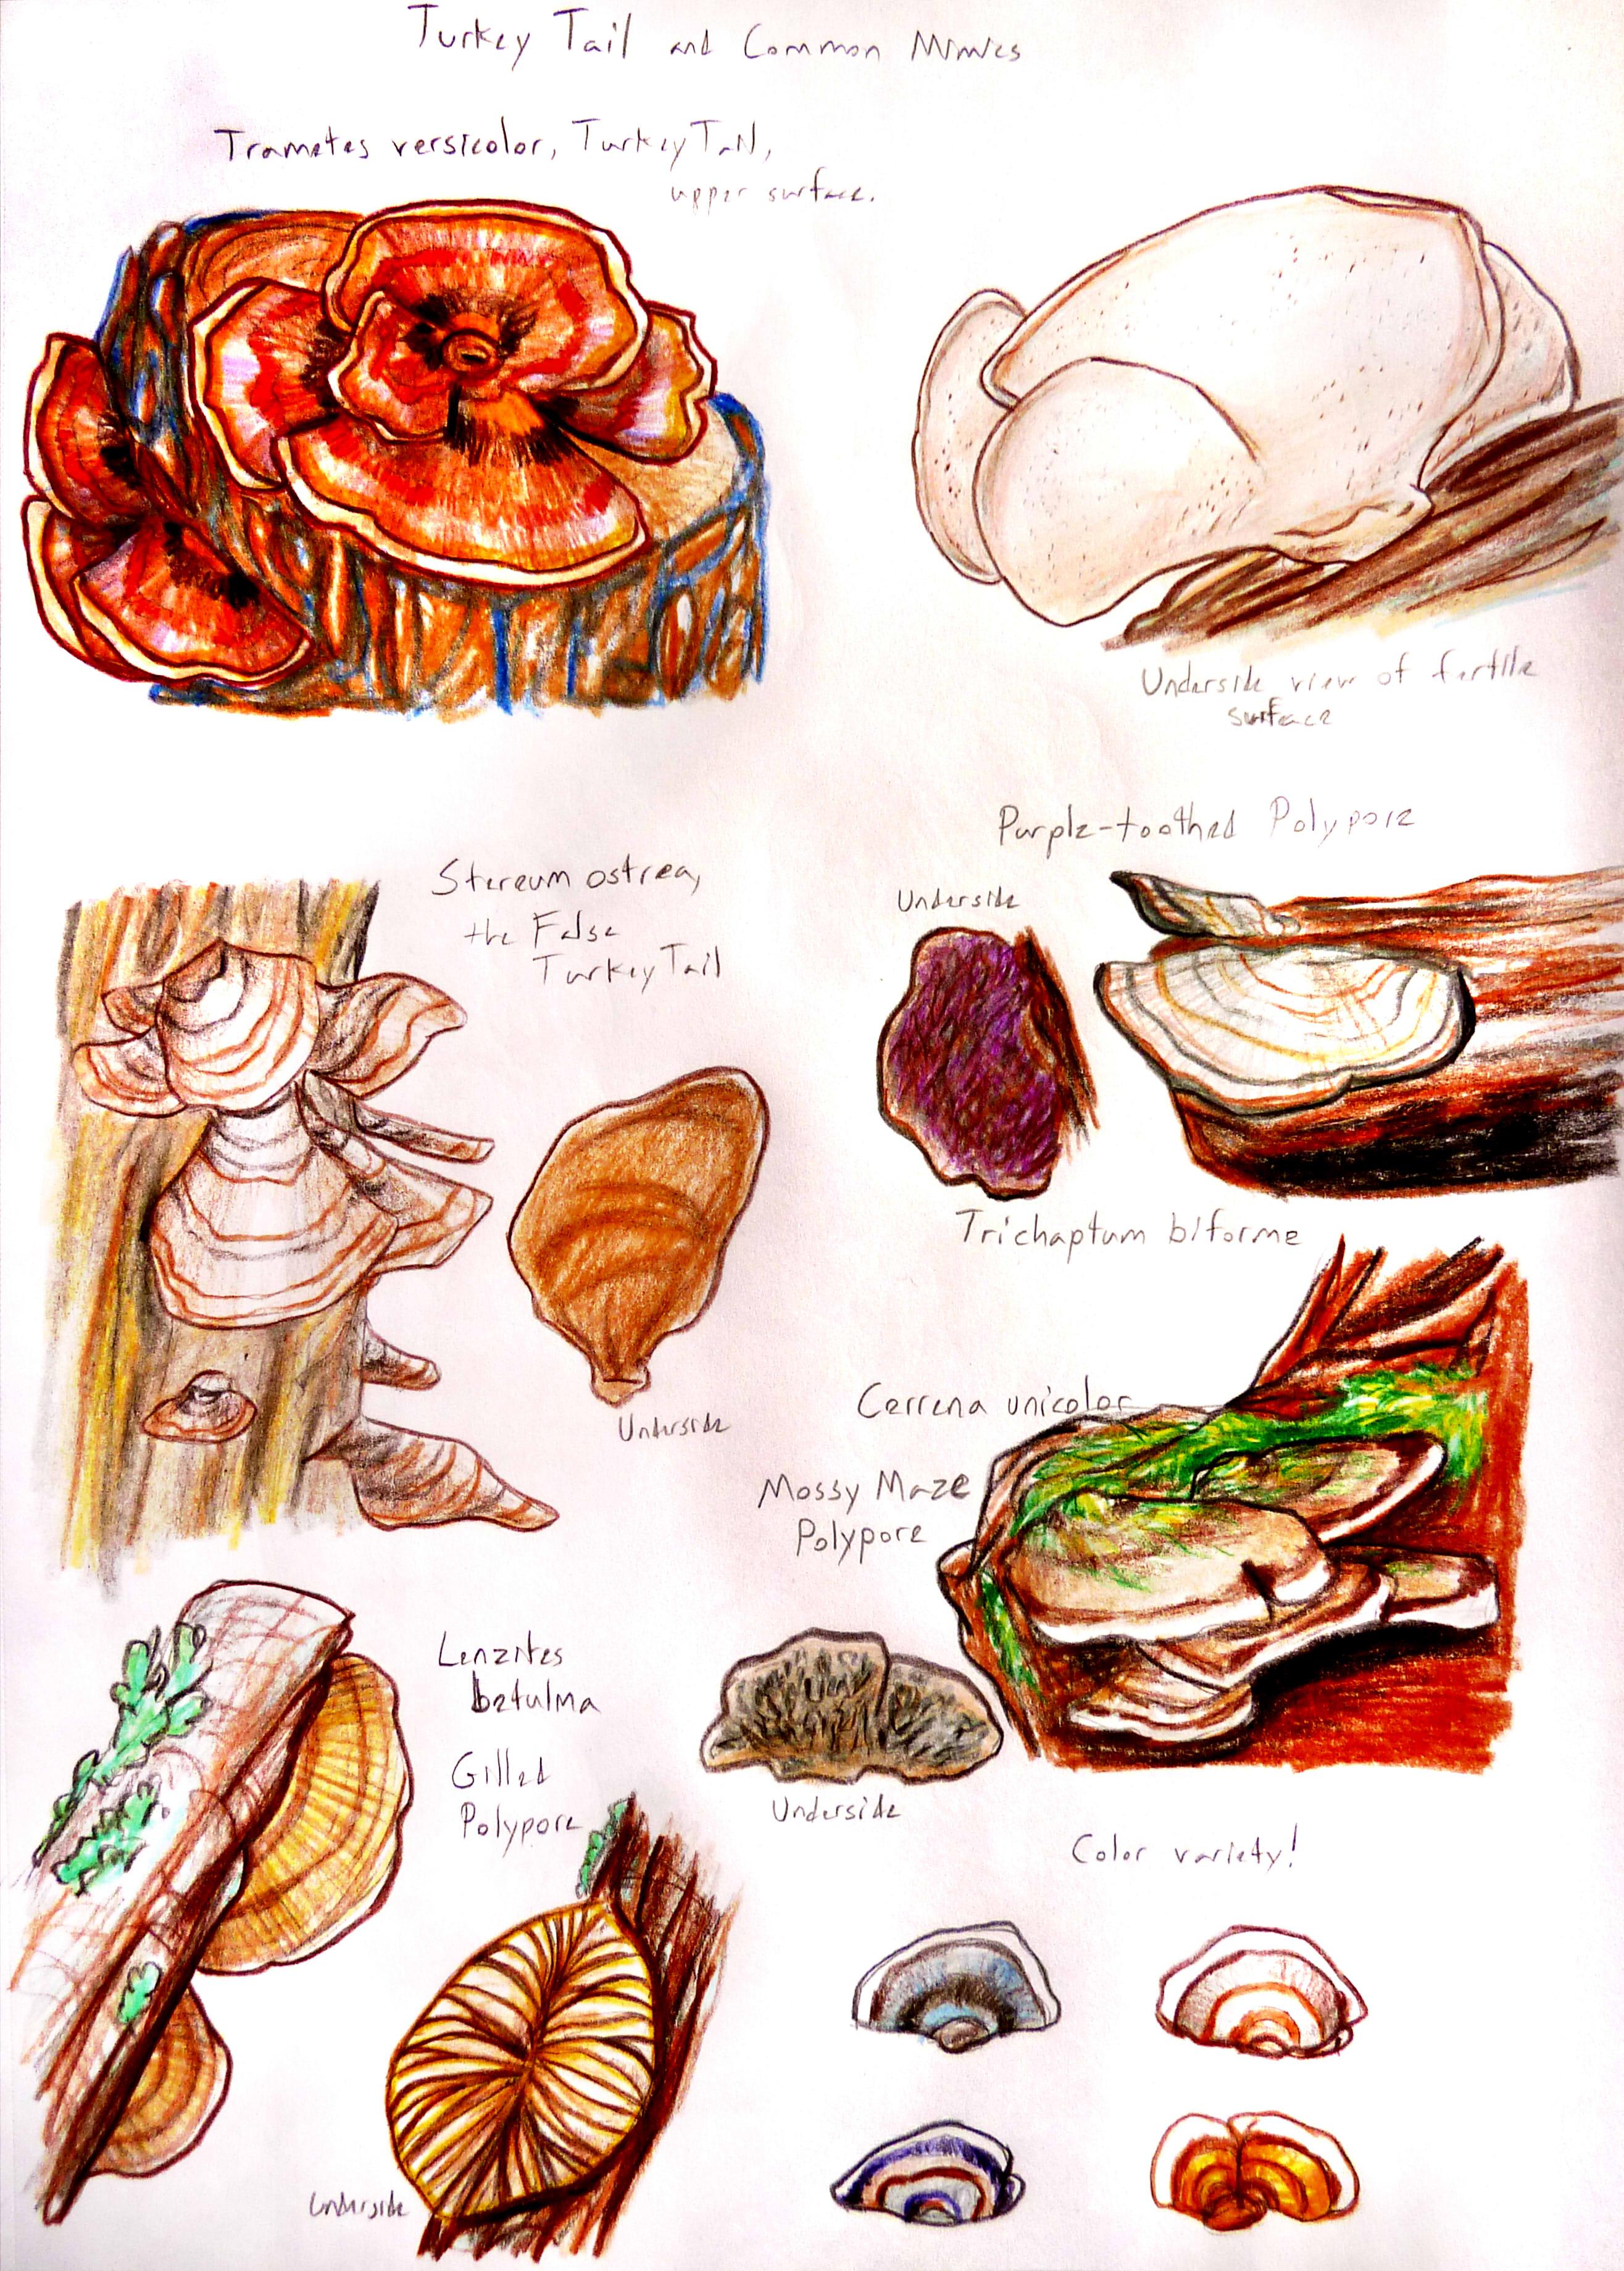 Mushroom Guidesheet #4--Turkey Tail and Mimics — Weasyl